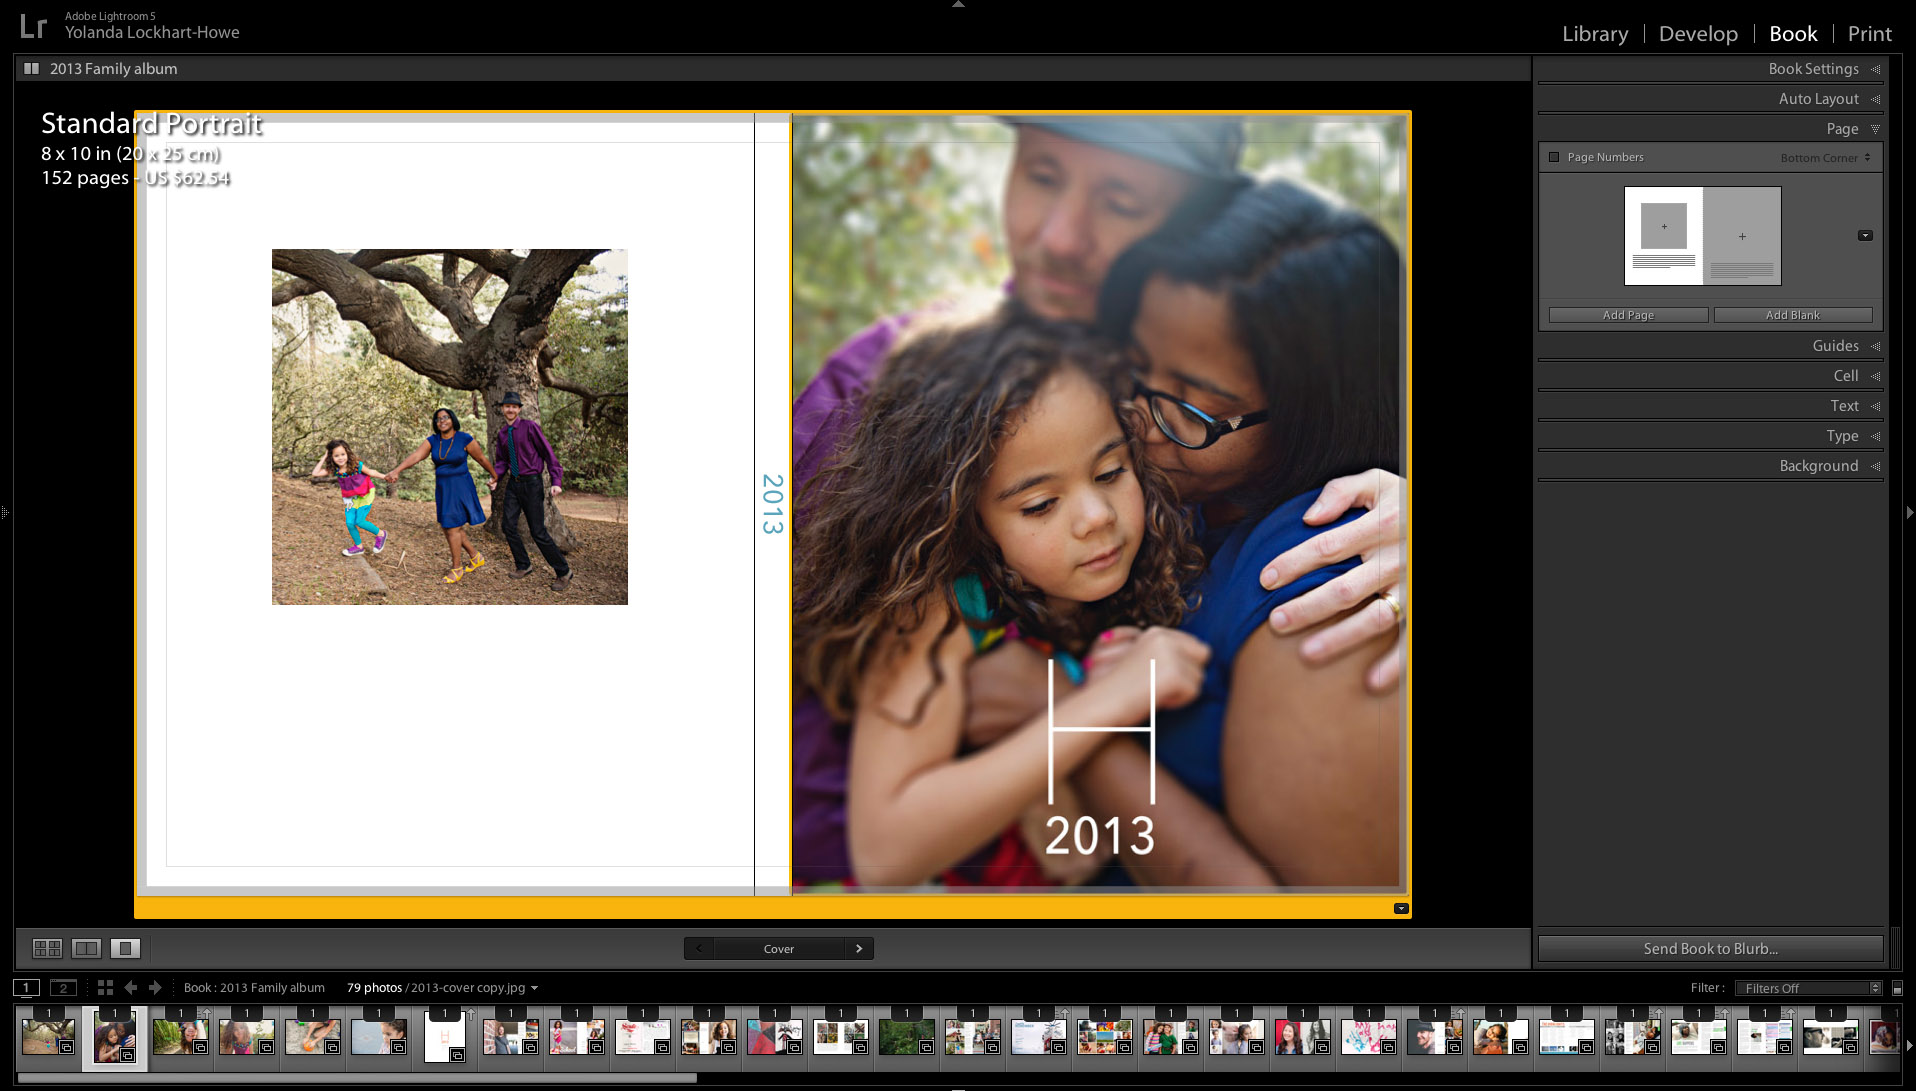 8x10 Blurb photo book | cover design in Lightroom | yolandamadethis.com